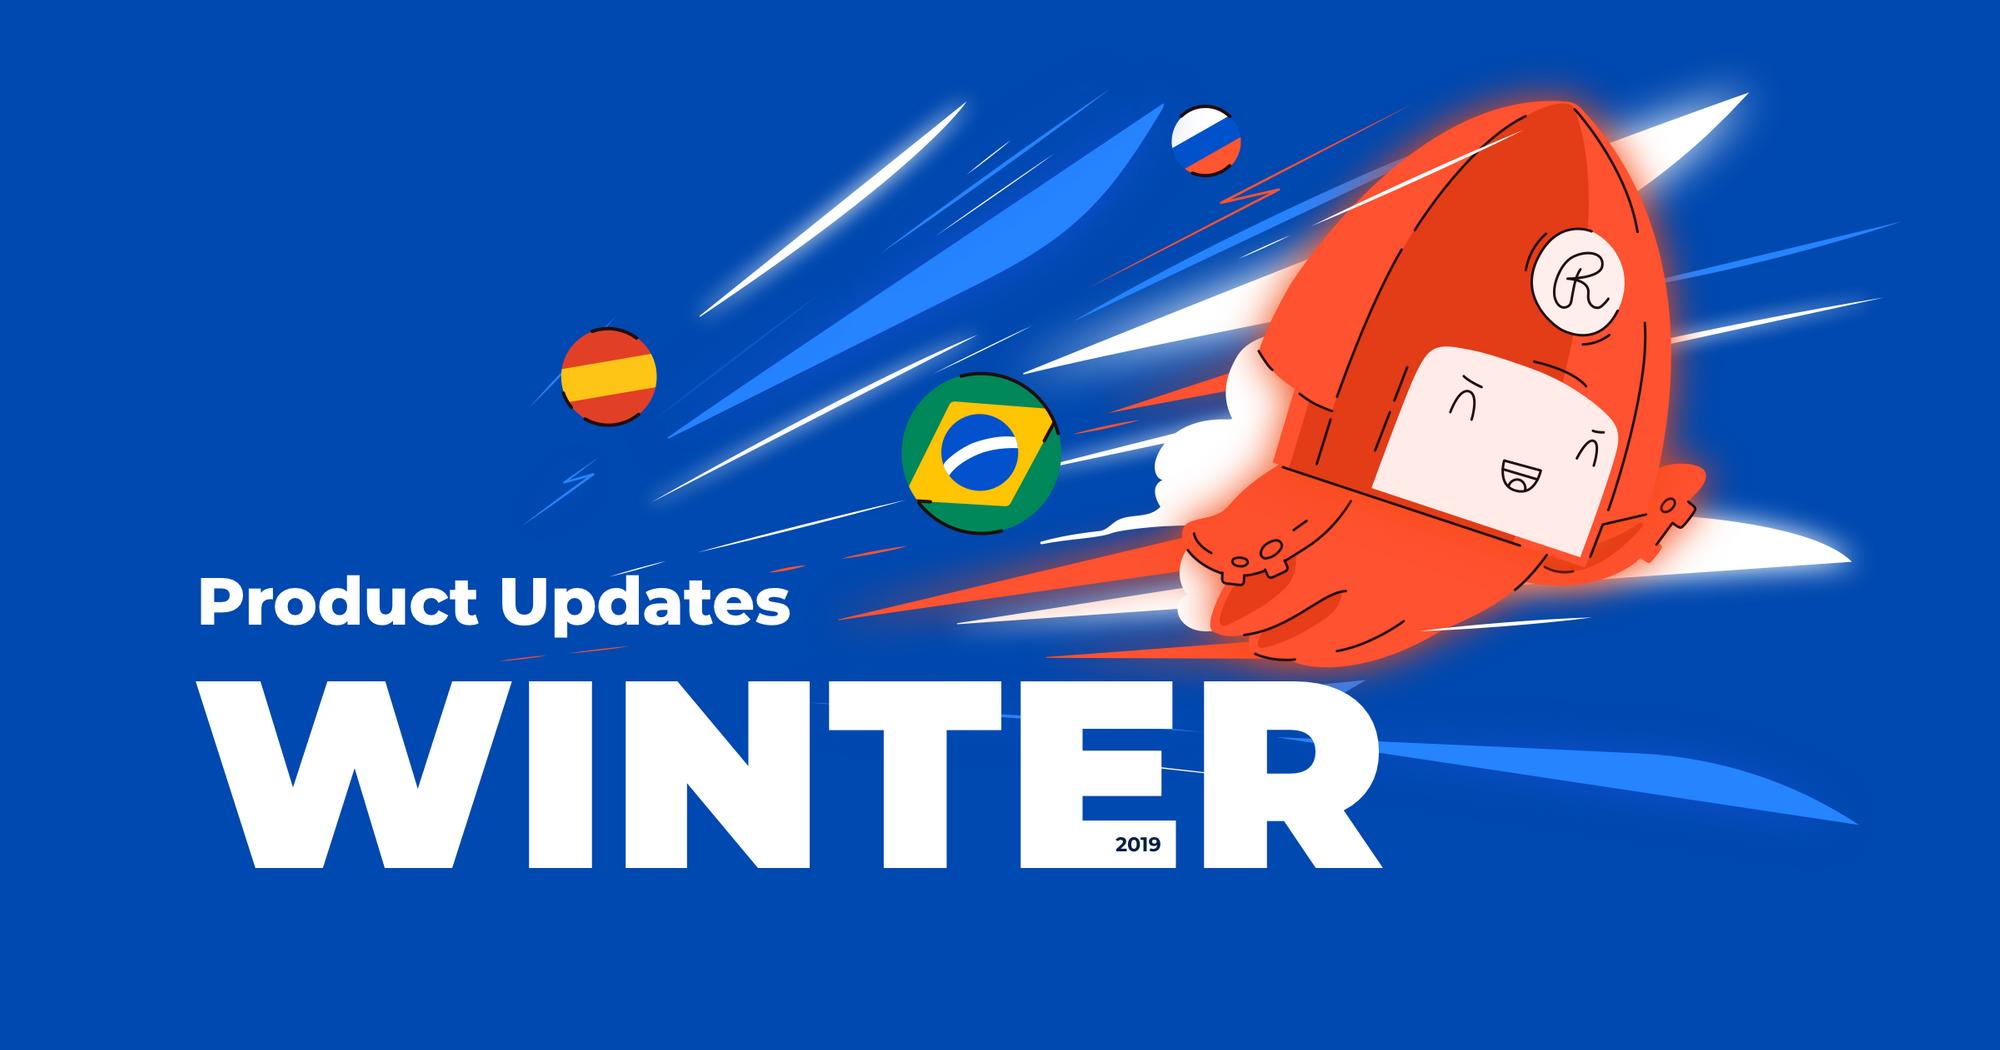 Restream winter product updates